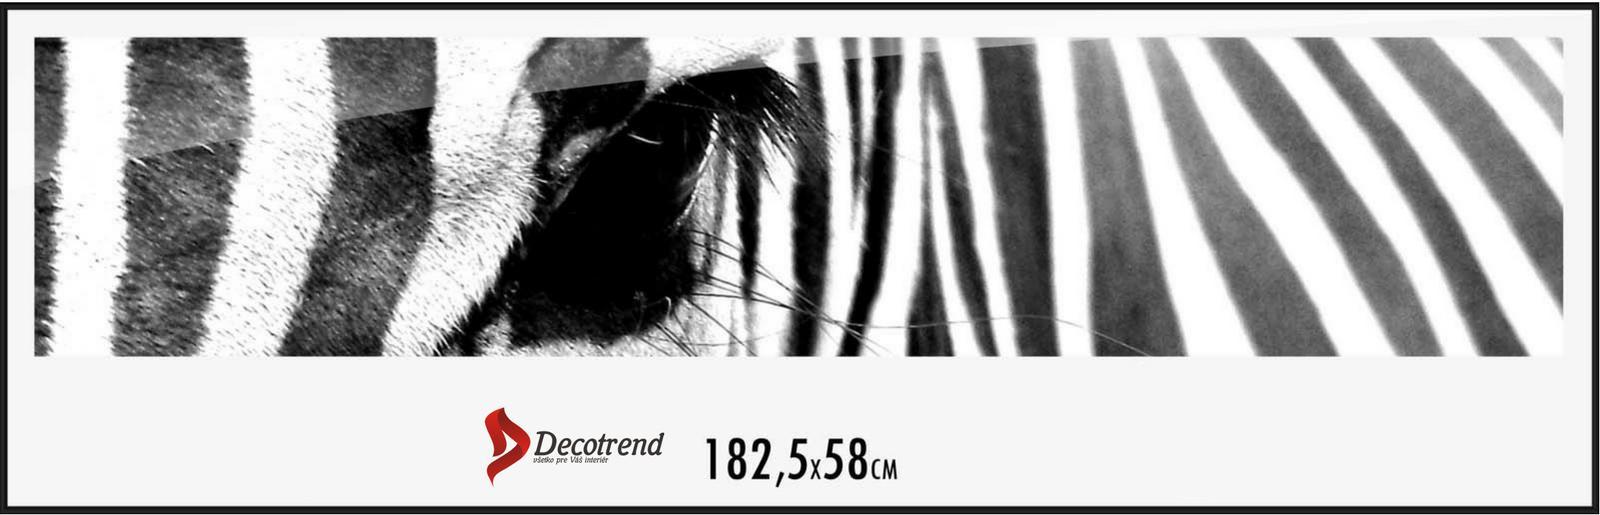 Klip rámy, Hliníkové rámy na fotky, plagáty, obrázky - Obrázok č. 5